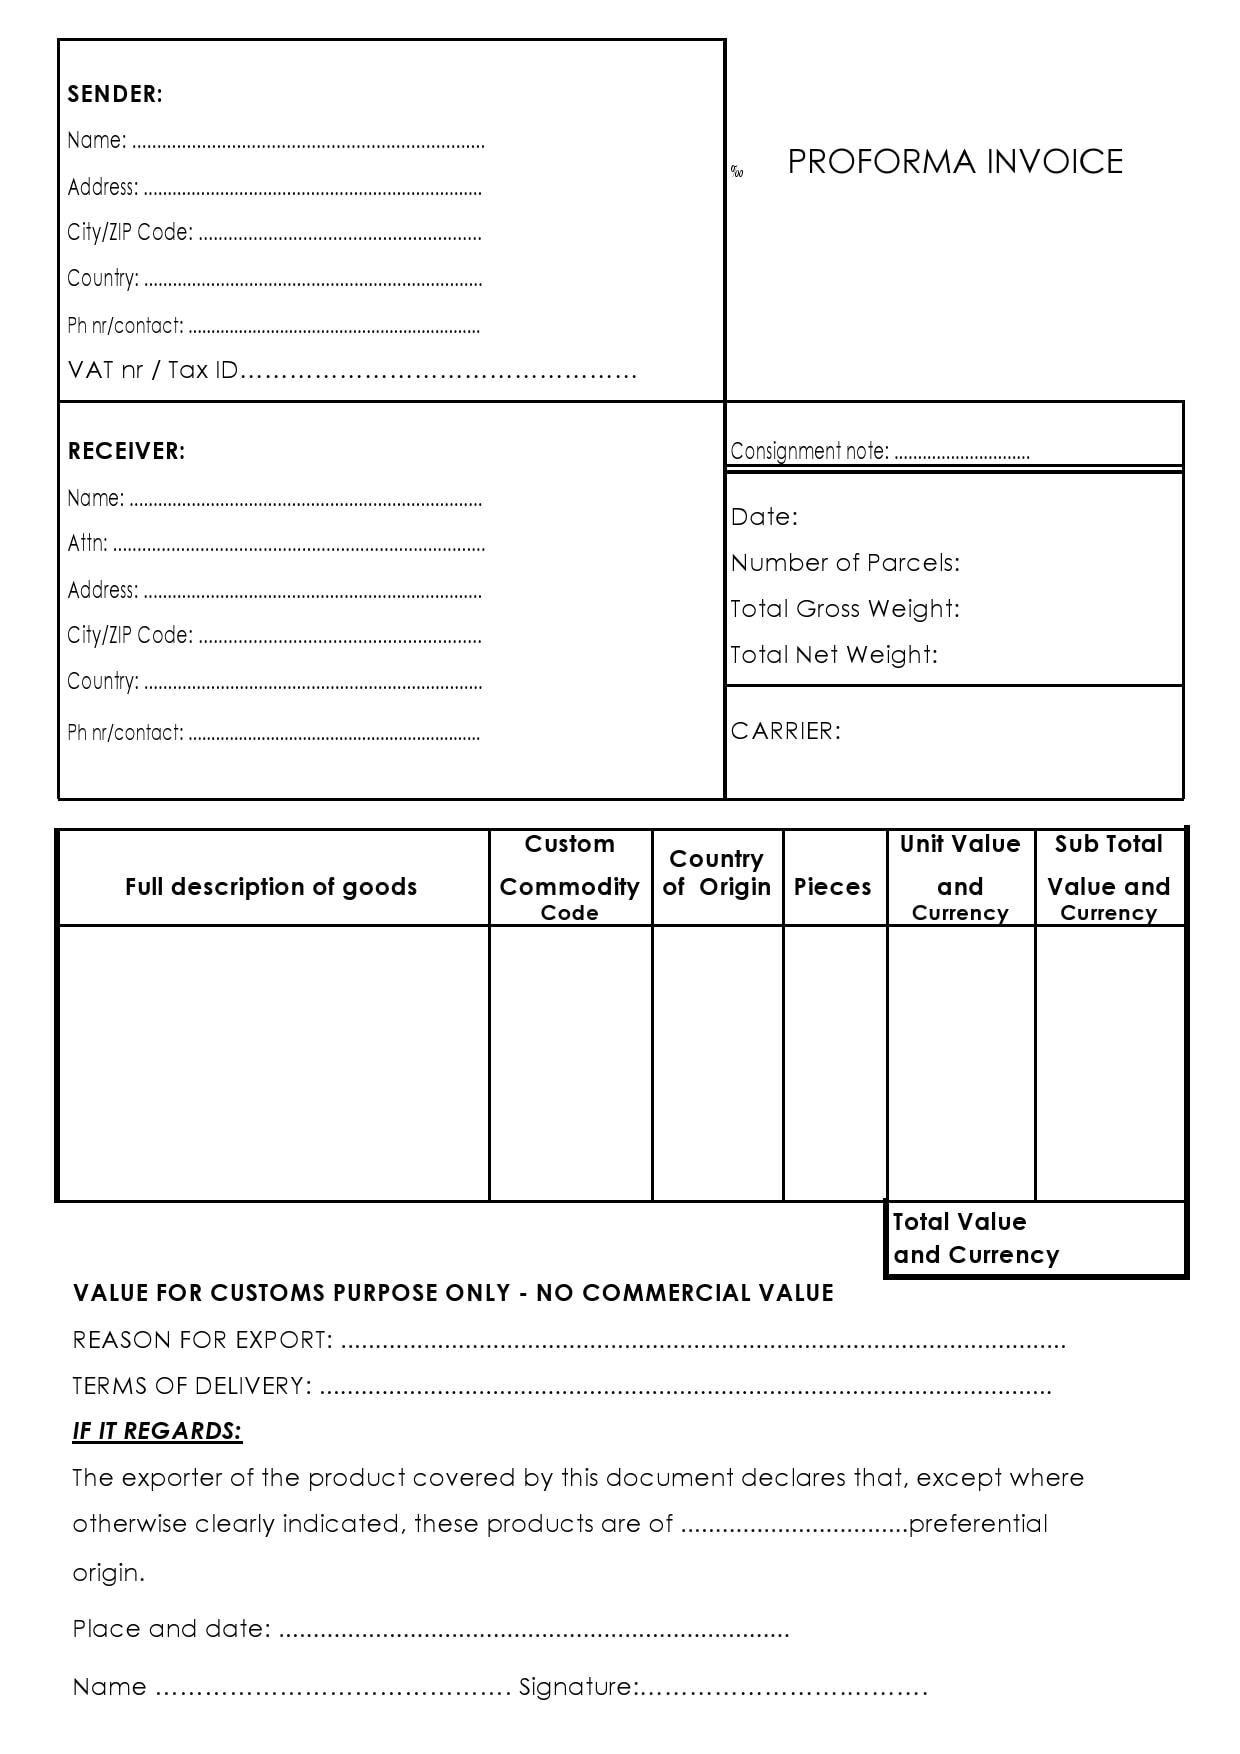 proforma invoice template 19